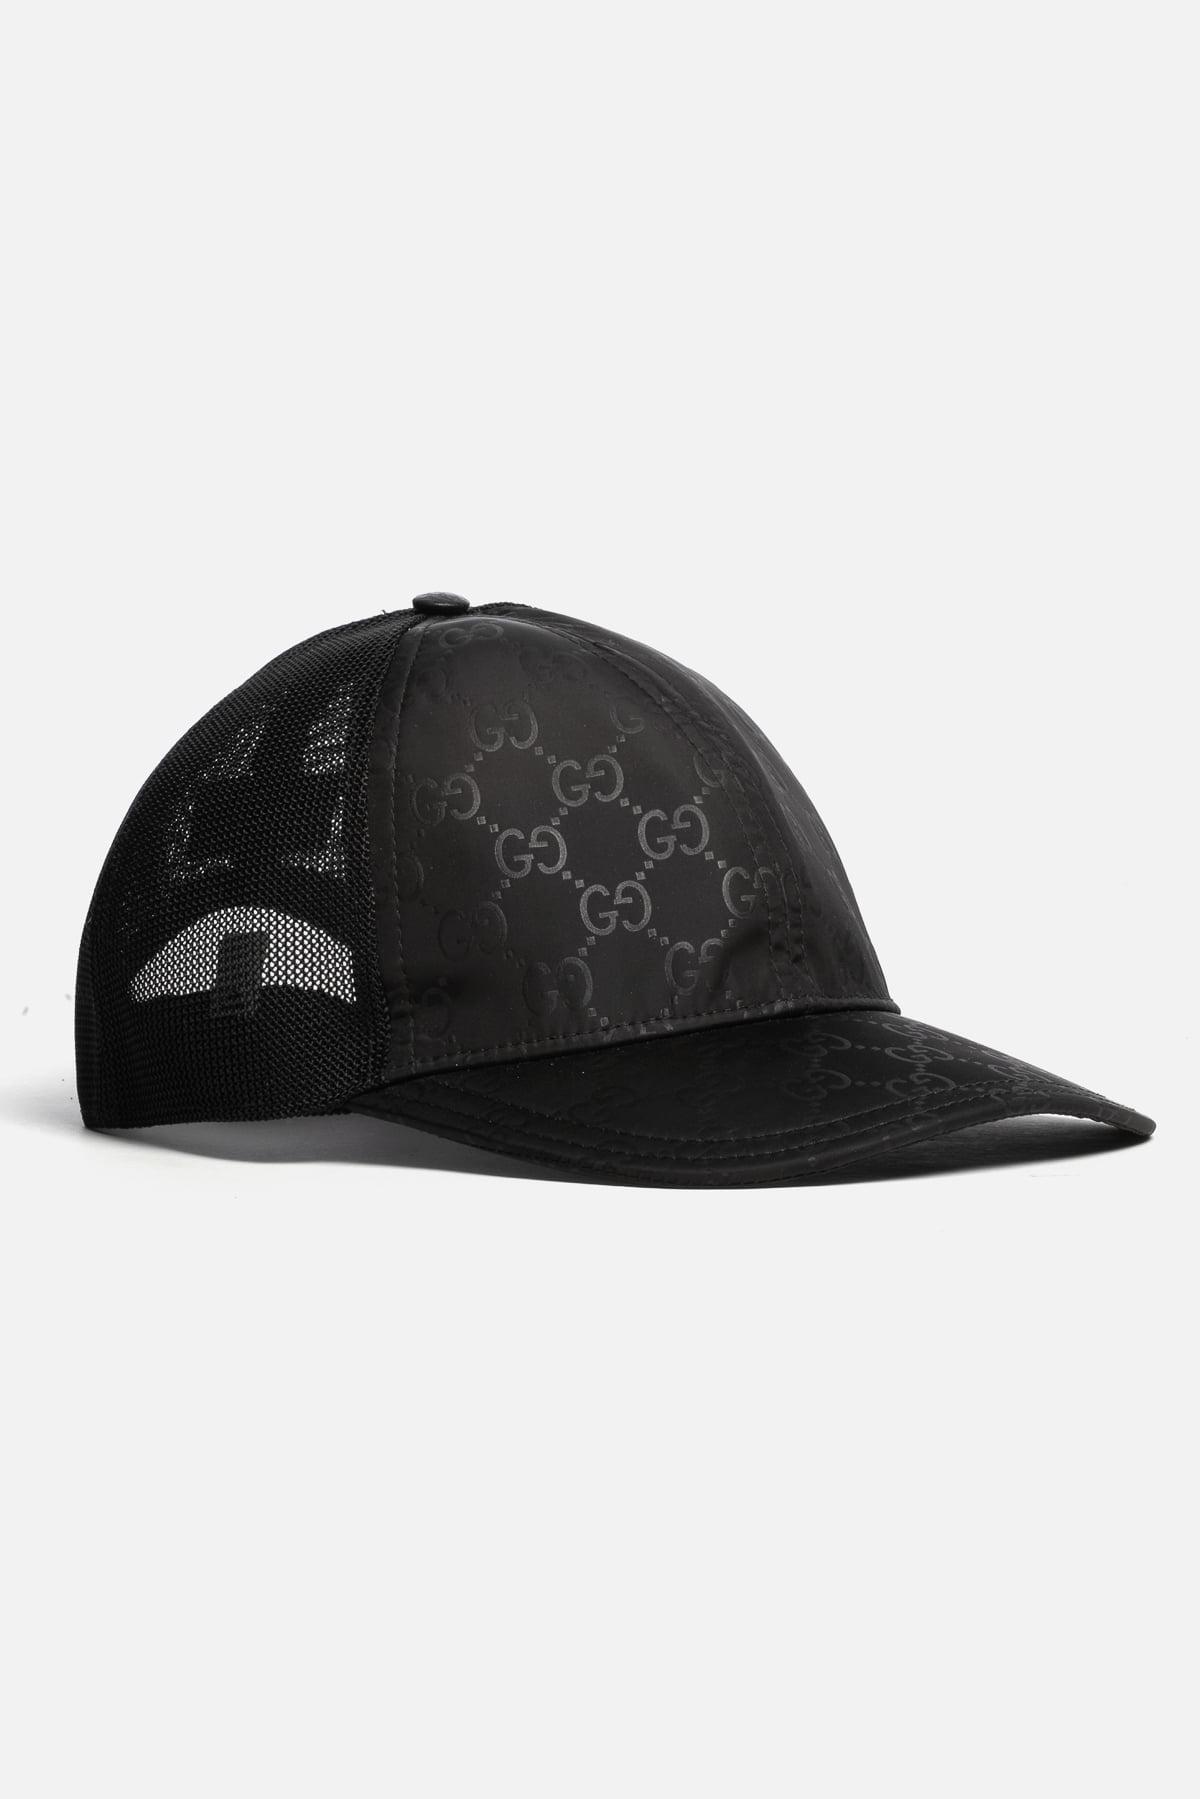 GG NYLON BASEBALL CAP